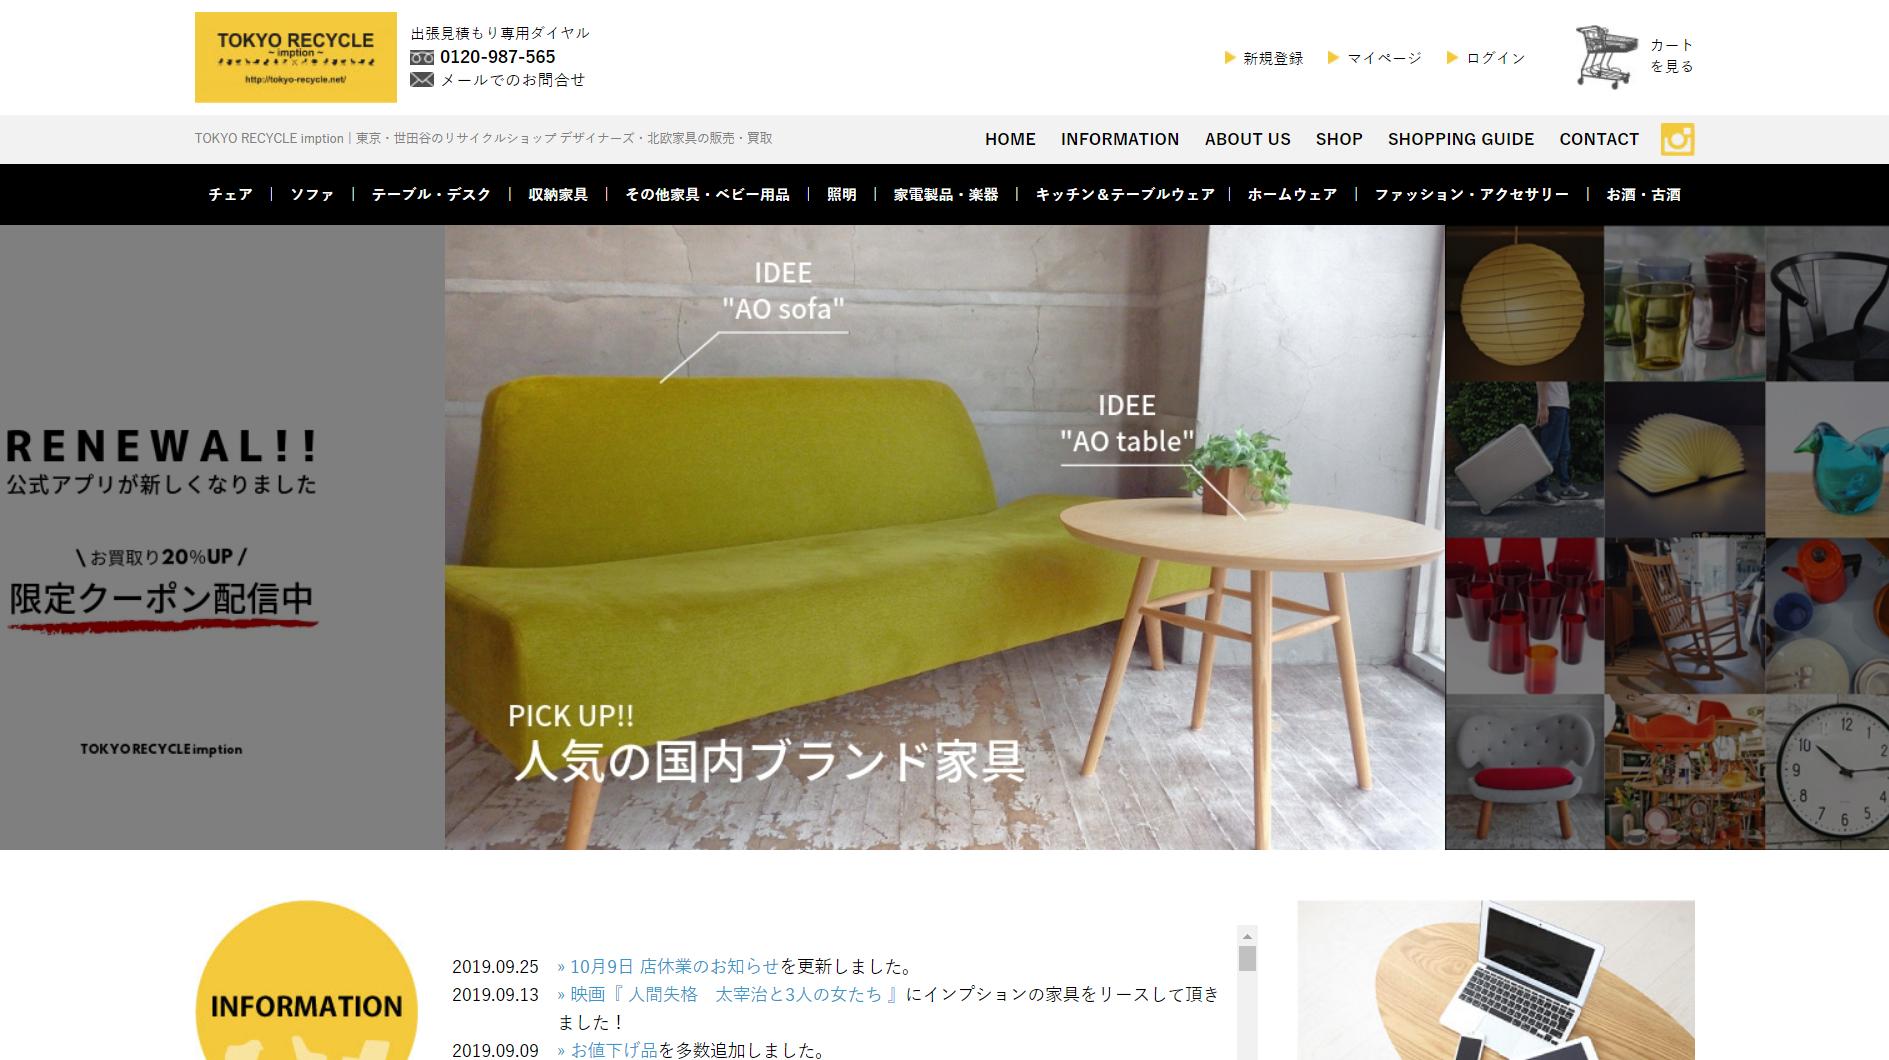 TOKYO RECYCLE imptionの世界観が表現された自社ECサイトのトップページ